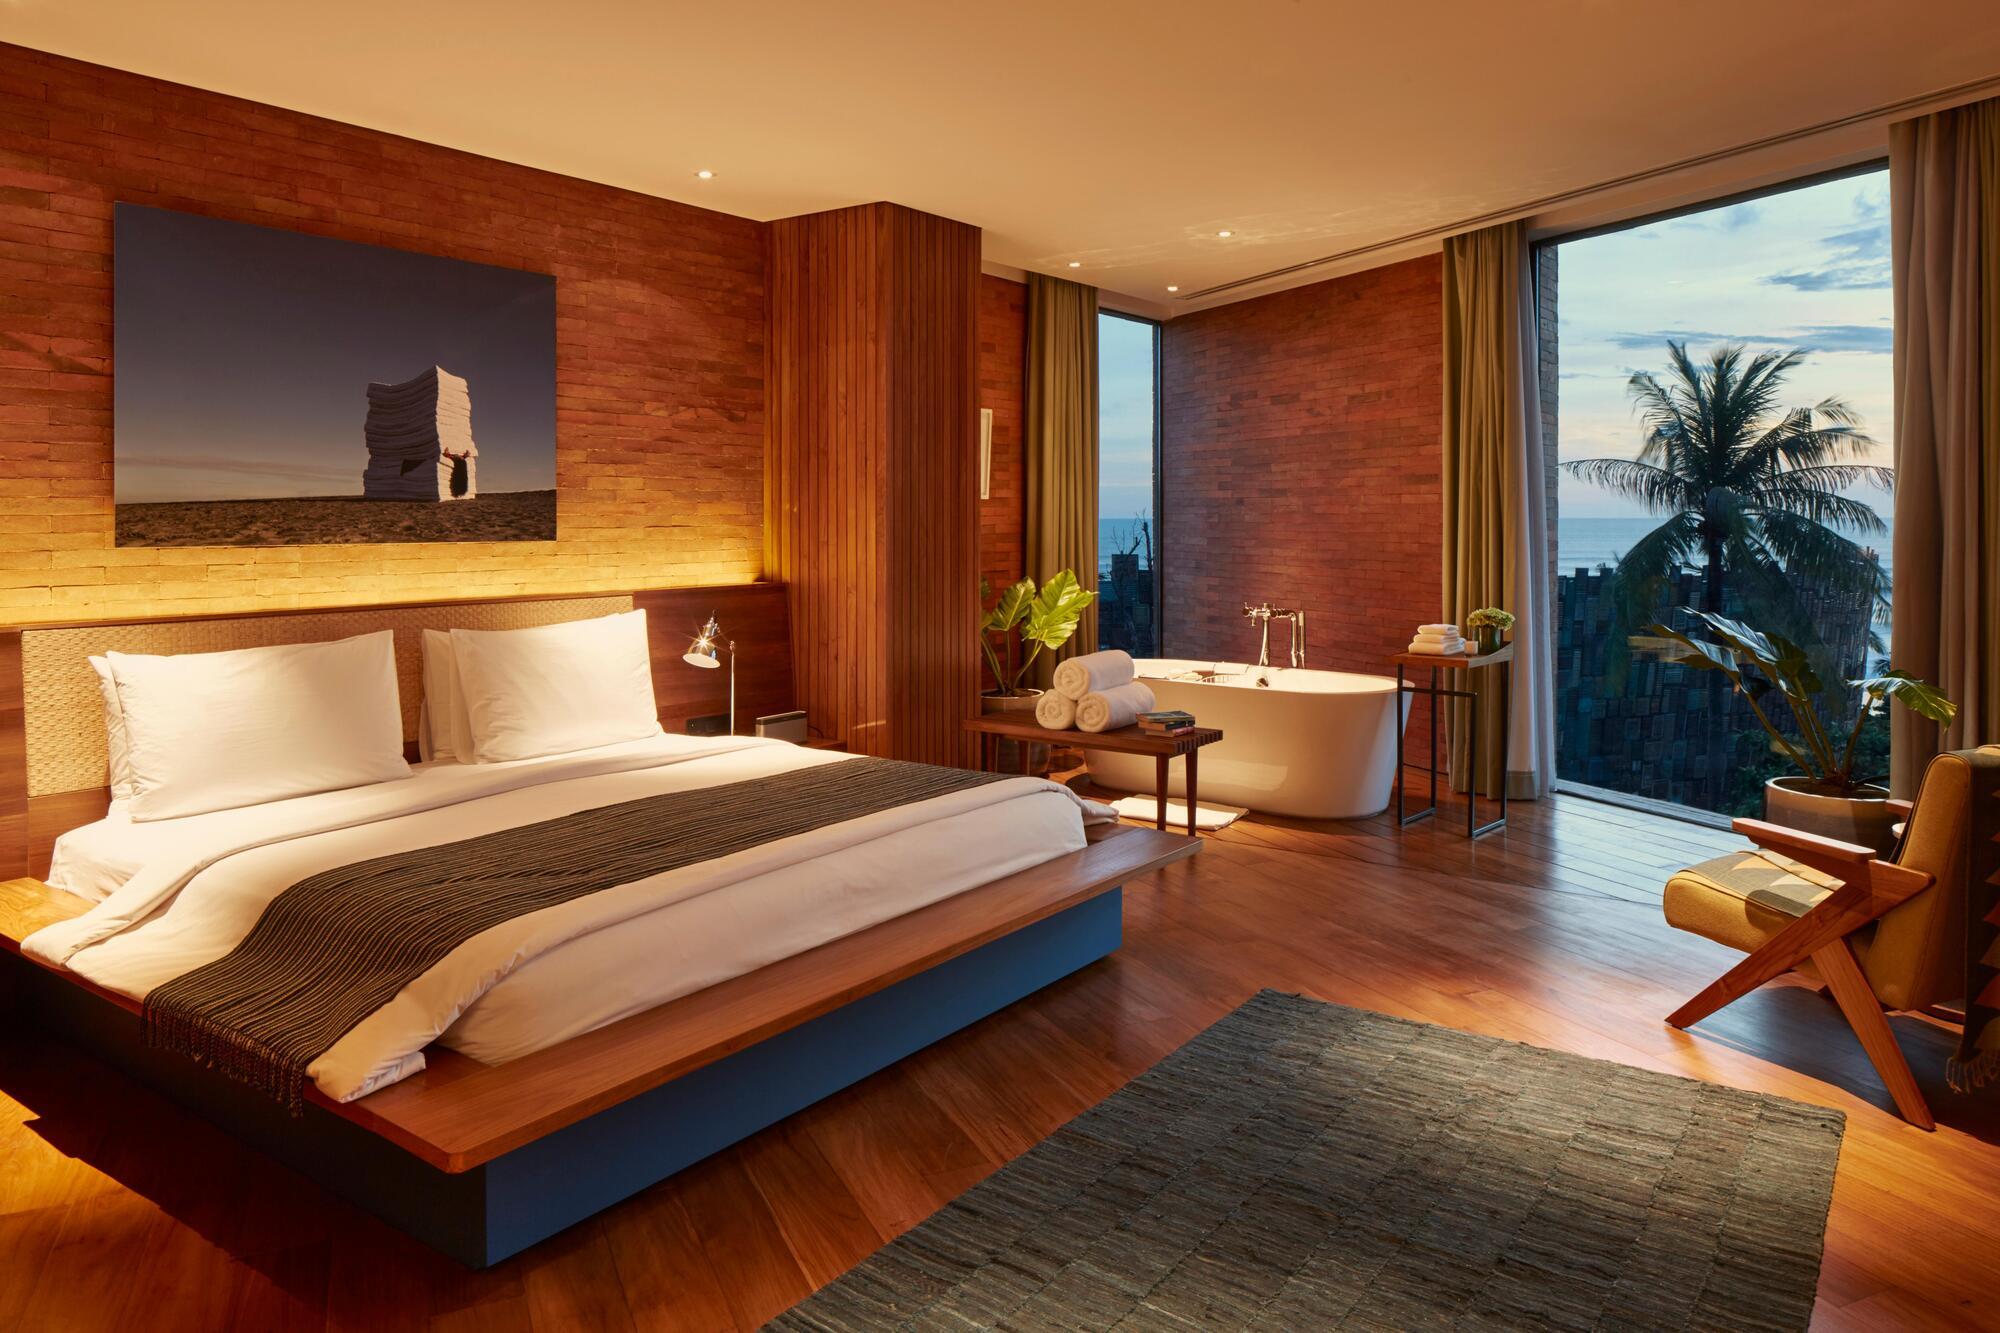 Katamana Hotel, Seminyak, Bali Image 1